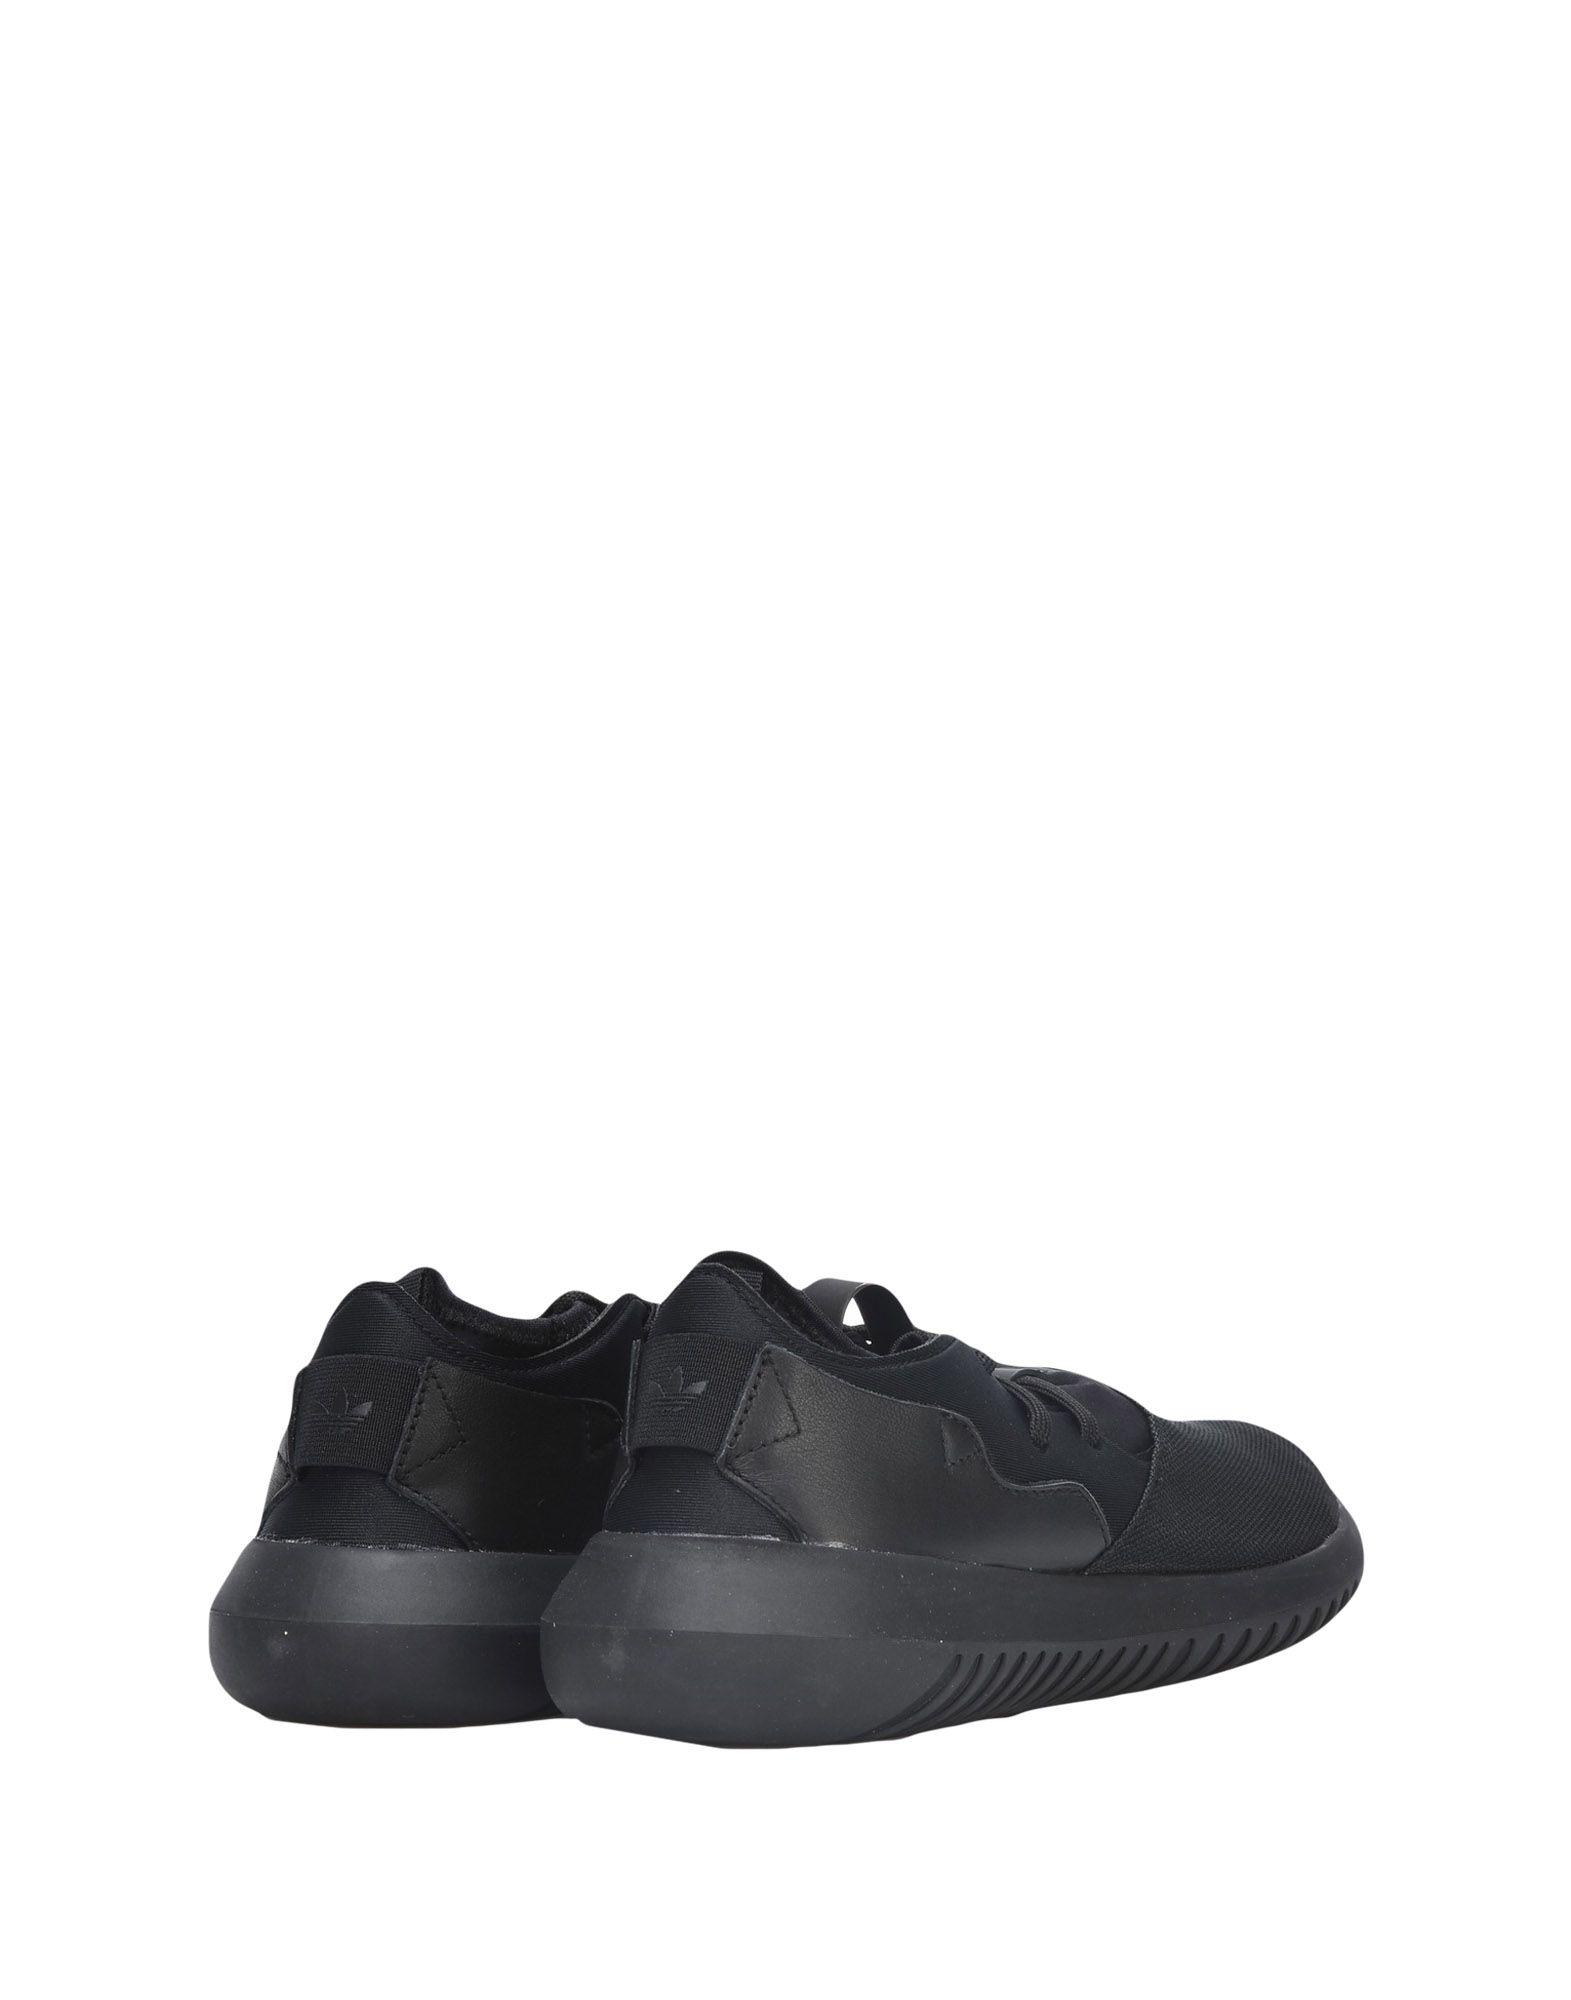 Adidas Originals Tubular Entrap Qualität W  11220608LF Gute Qualität Entrap beliebte Schuhe f600d4